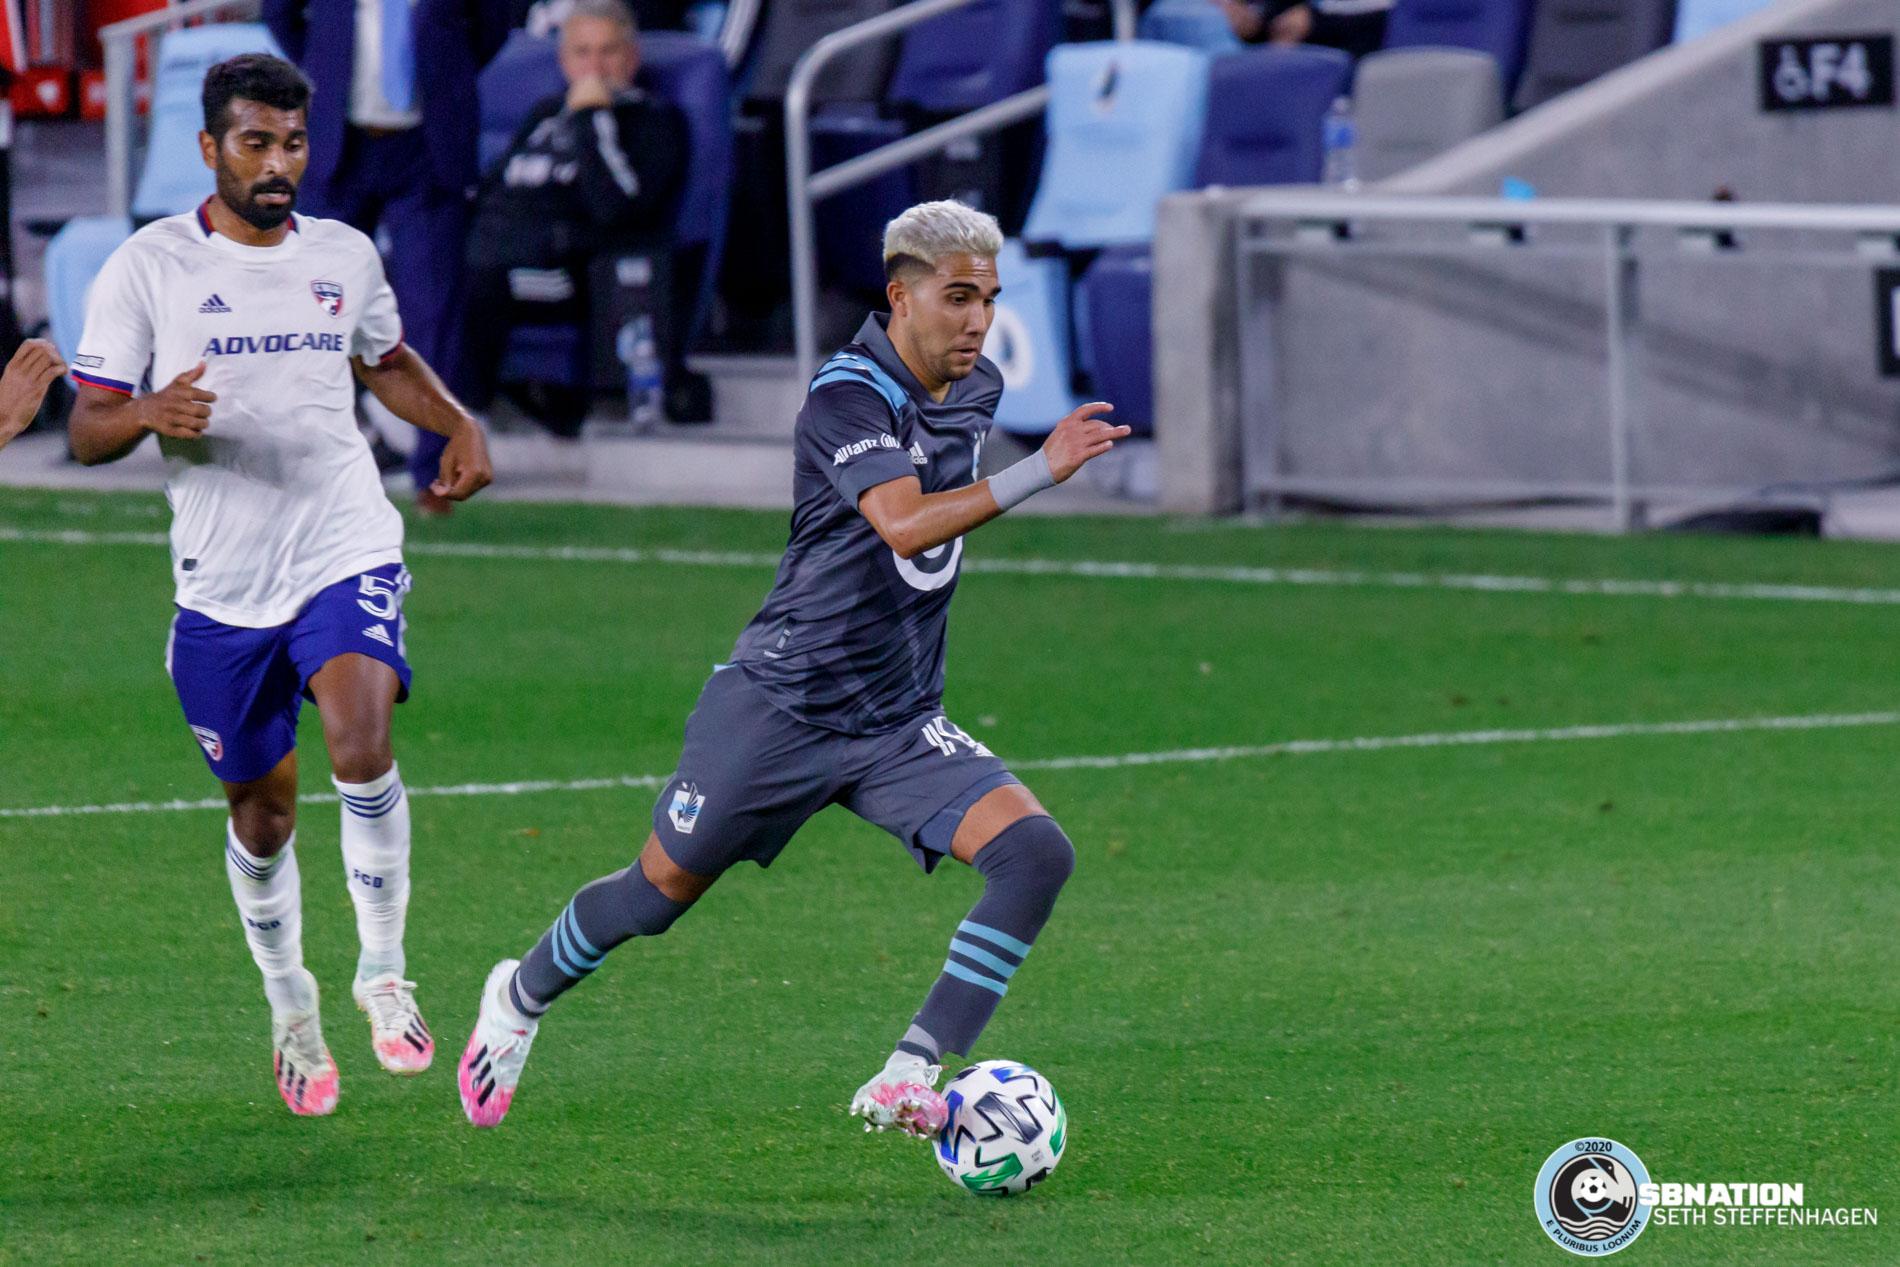 November 8, 2020 - Saint Paul, Minnesota, United States - Minnesota United midfielder Emanuel Reynoso (10) dribbles the ball during the match against FC Dallas at Allianz Field.